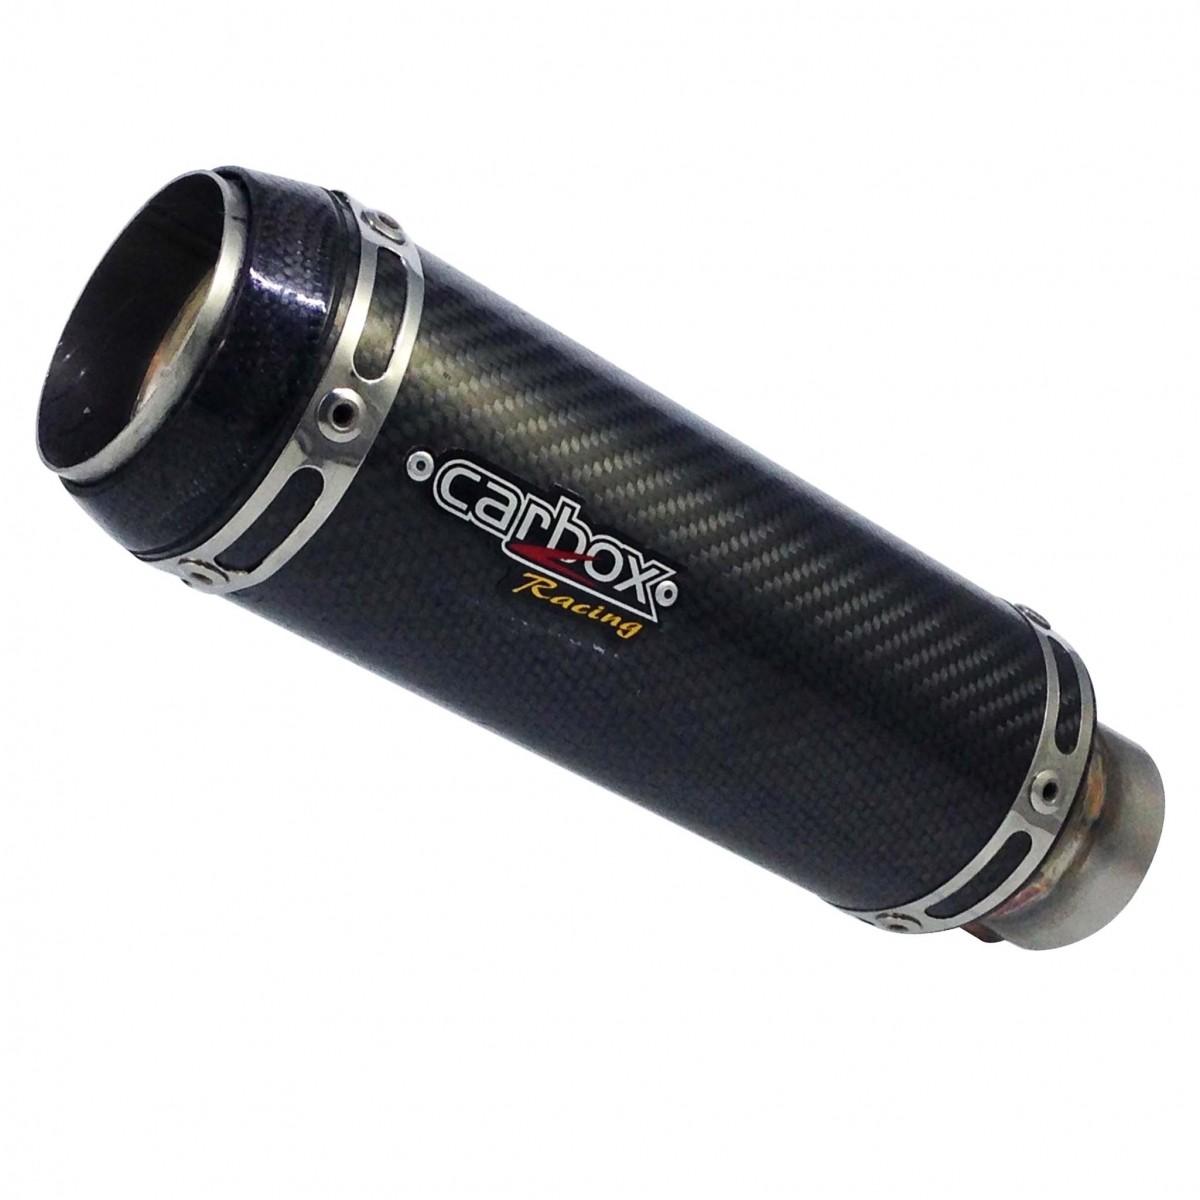 Ponteira GP Tech 2 Carbon p/ Suzuki SRAD GSXR1000 2007 a 2010